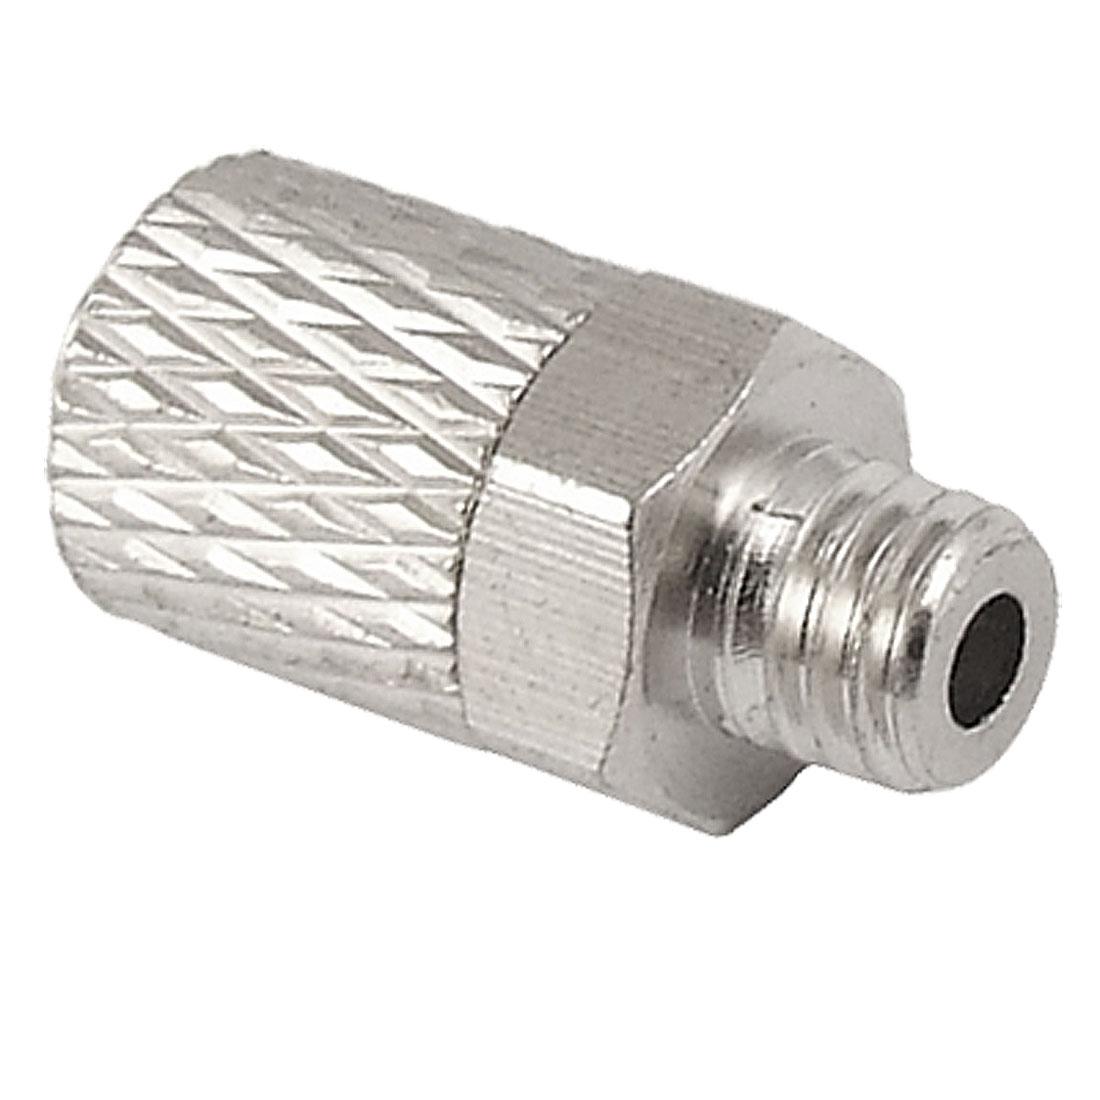 5mm Male Thread Quick Screw Tube Mini Straight Fitting